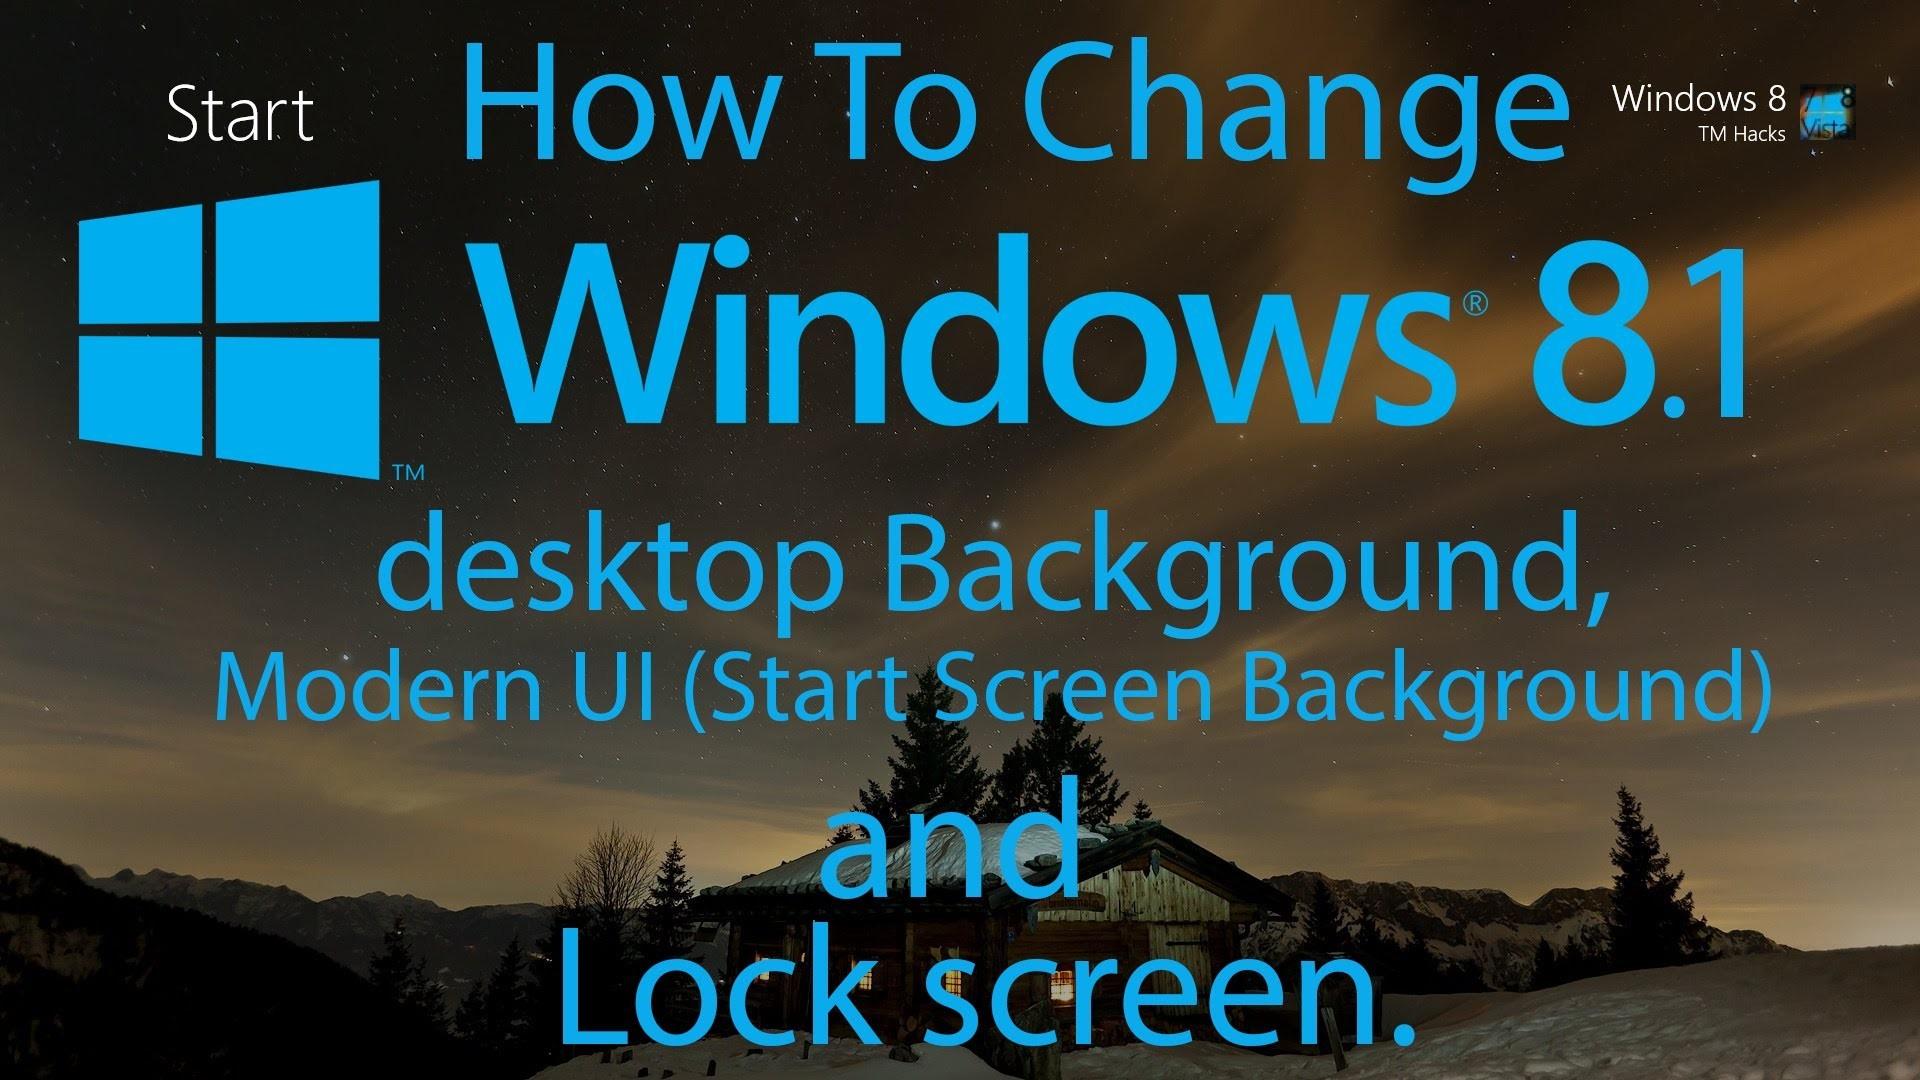 How To Change Windows 8.1 desktop Background, Modern UI (Start Screen  Background) and Lock screen. – YouTube